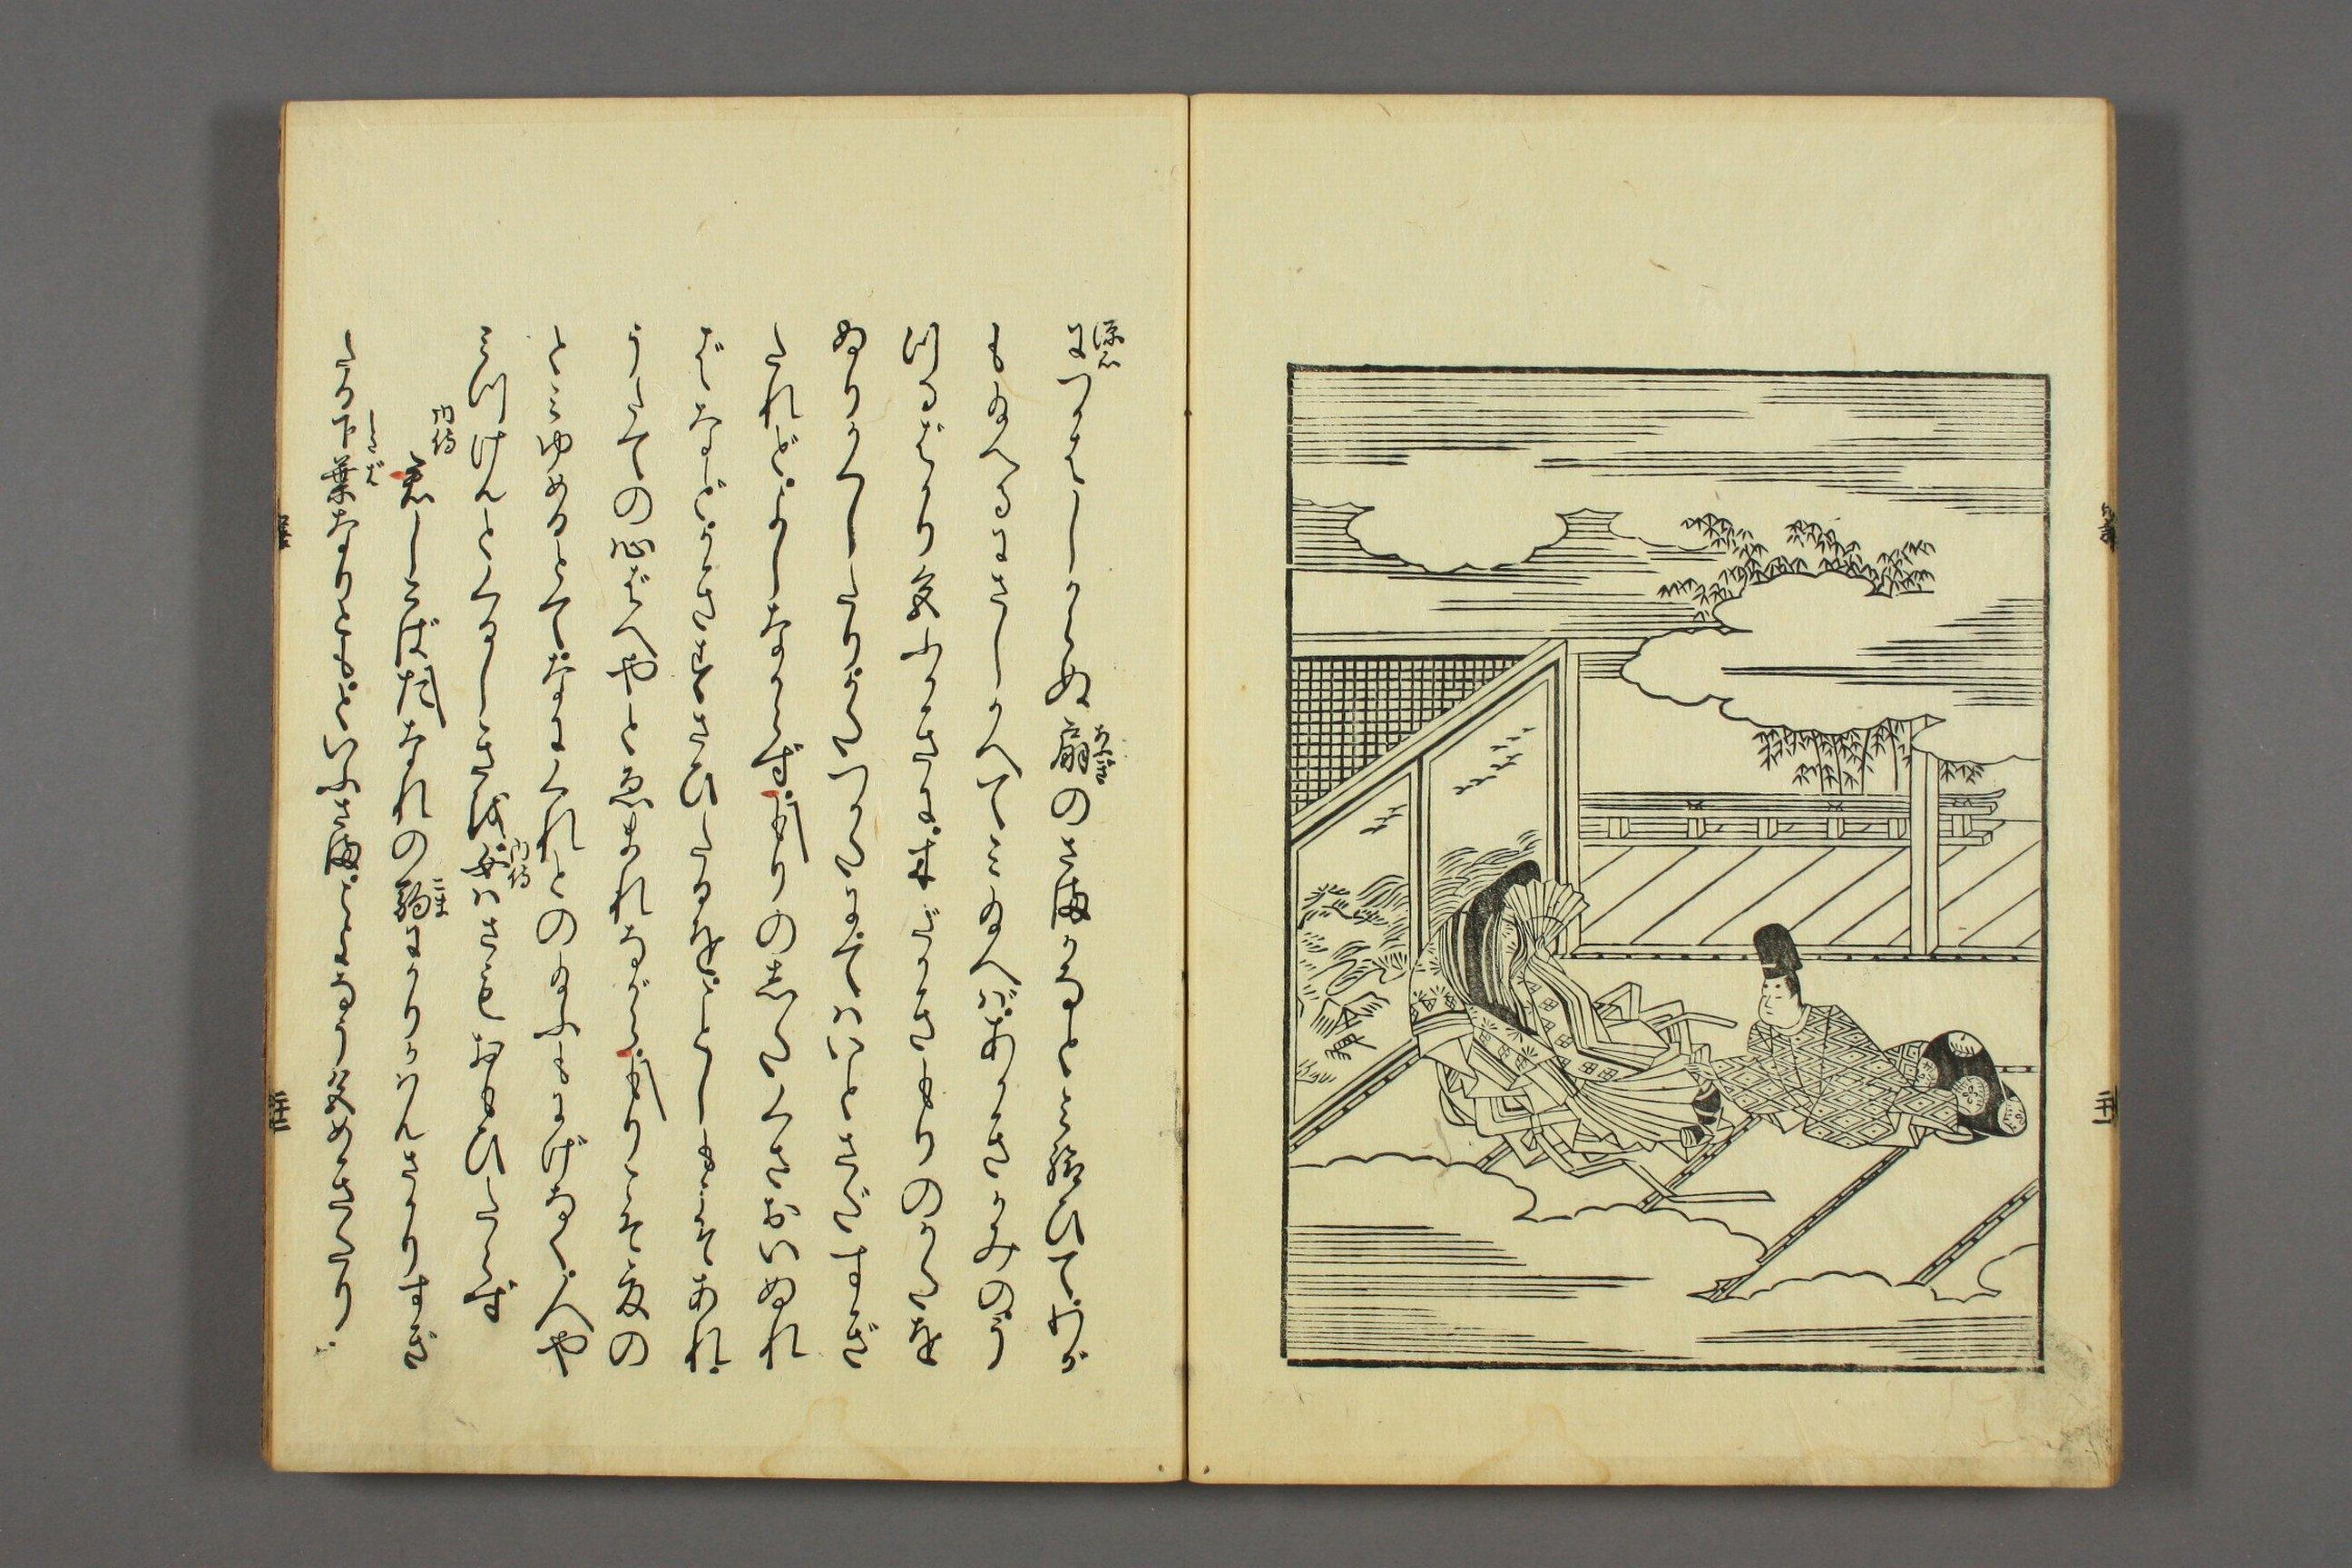 http://archive.wul.waseda.ac.jp/kosho/bunko30/bunko30_a0007/bunko30_a0007_0007/bunko30_a0007_0007_p0023.jpg